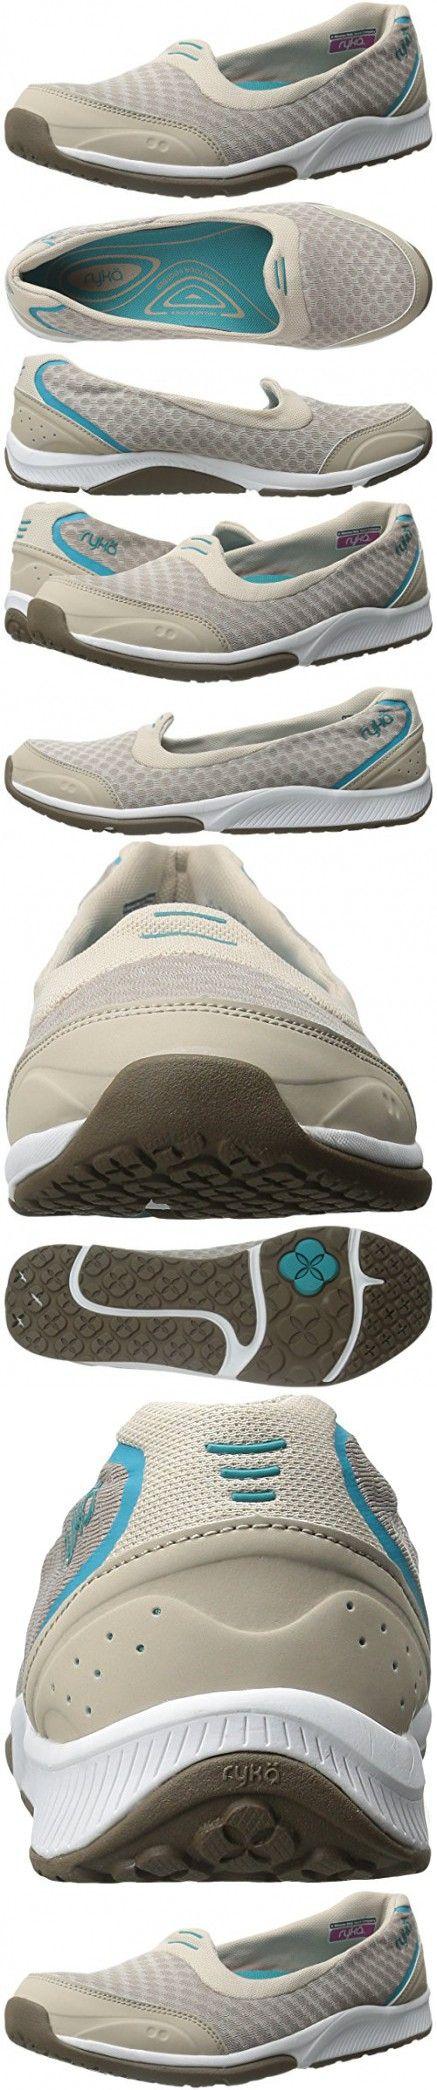 Zapatillas para caminar RYKA Women's Dash 3, gris / rosa, 9.5 M US